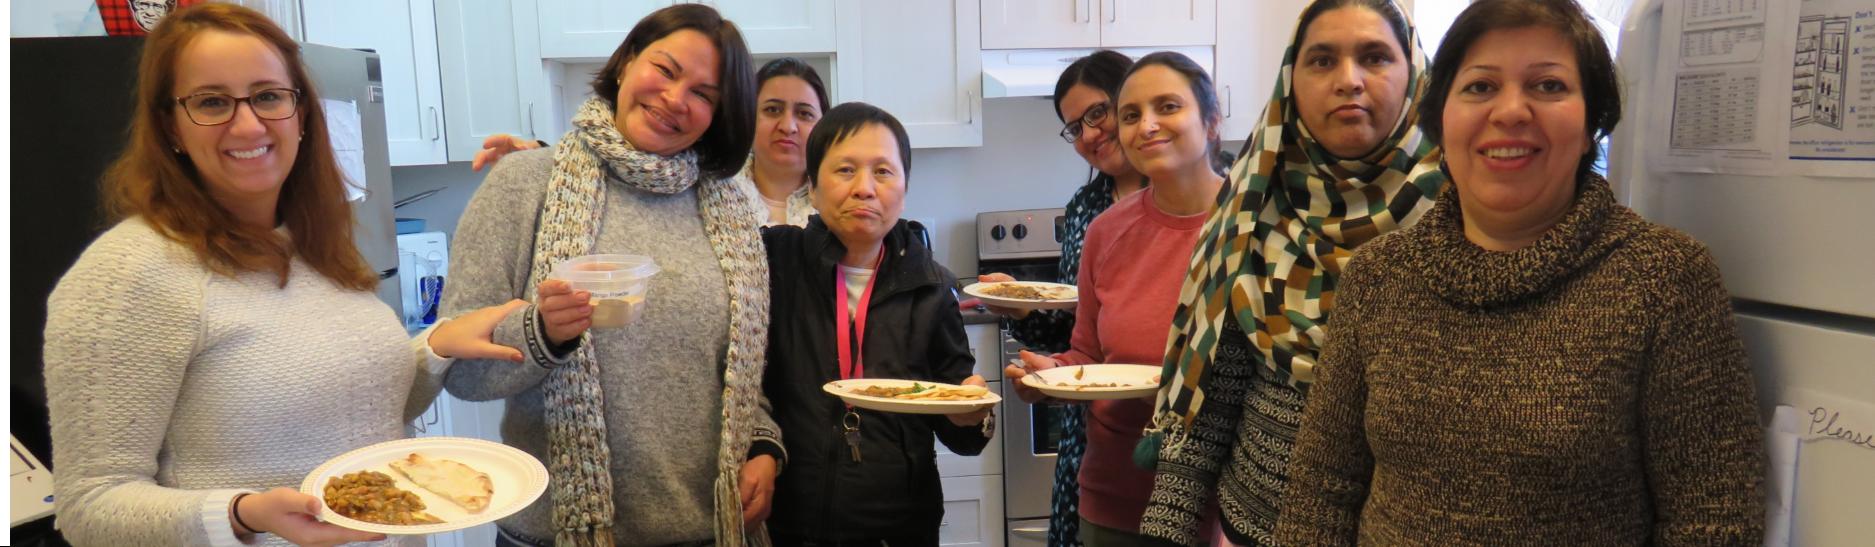 IWS_International Women of Saskatoon_cooking 2